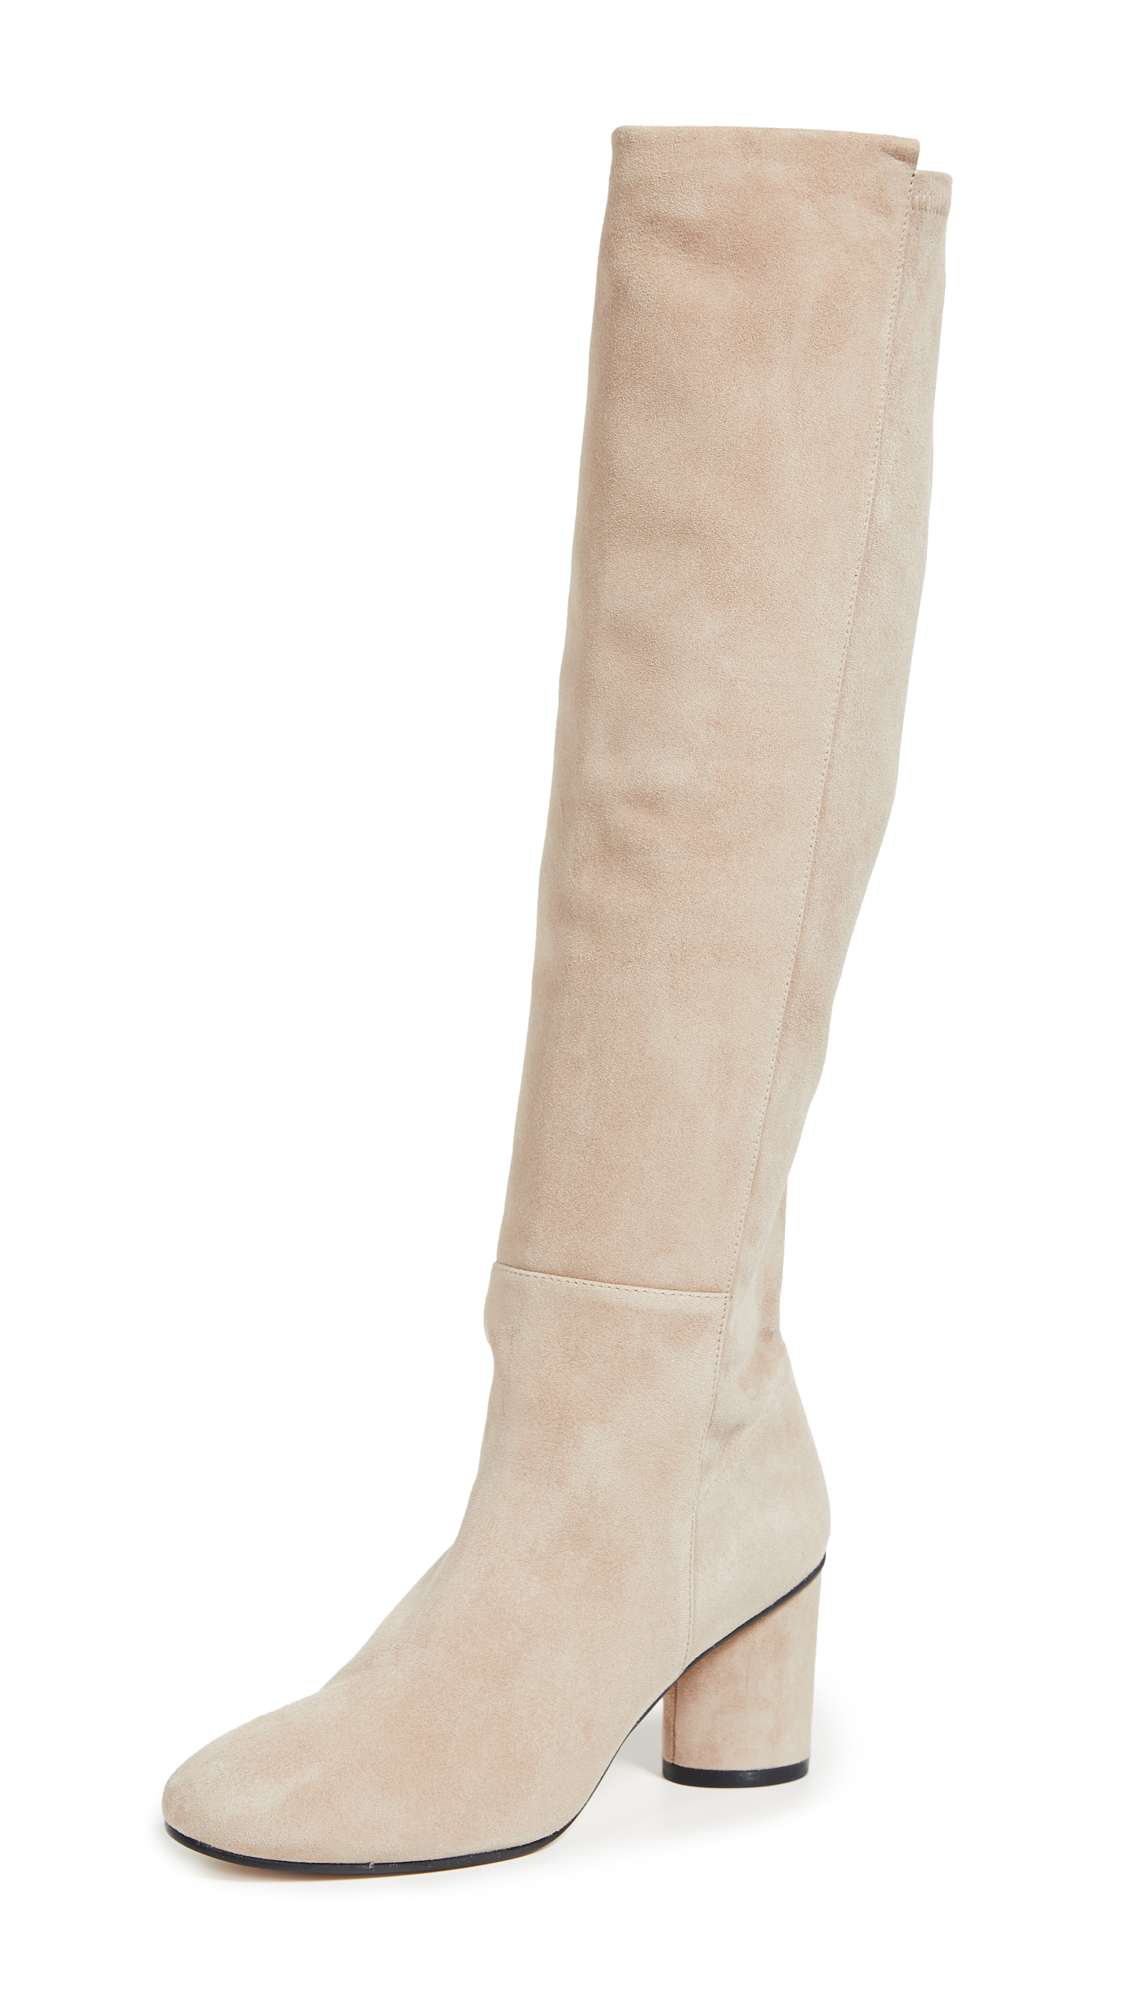 Stuart Weitzman Eloise Boots - Brownstone